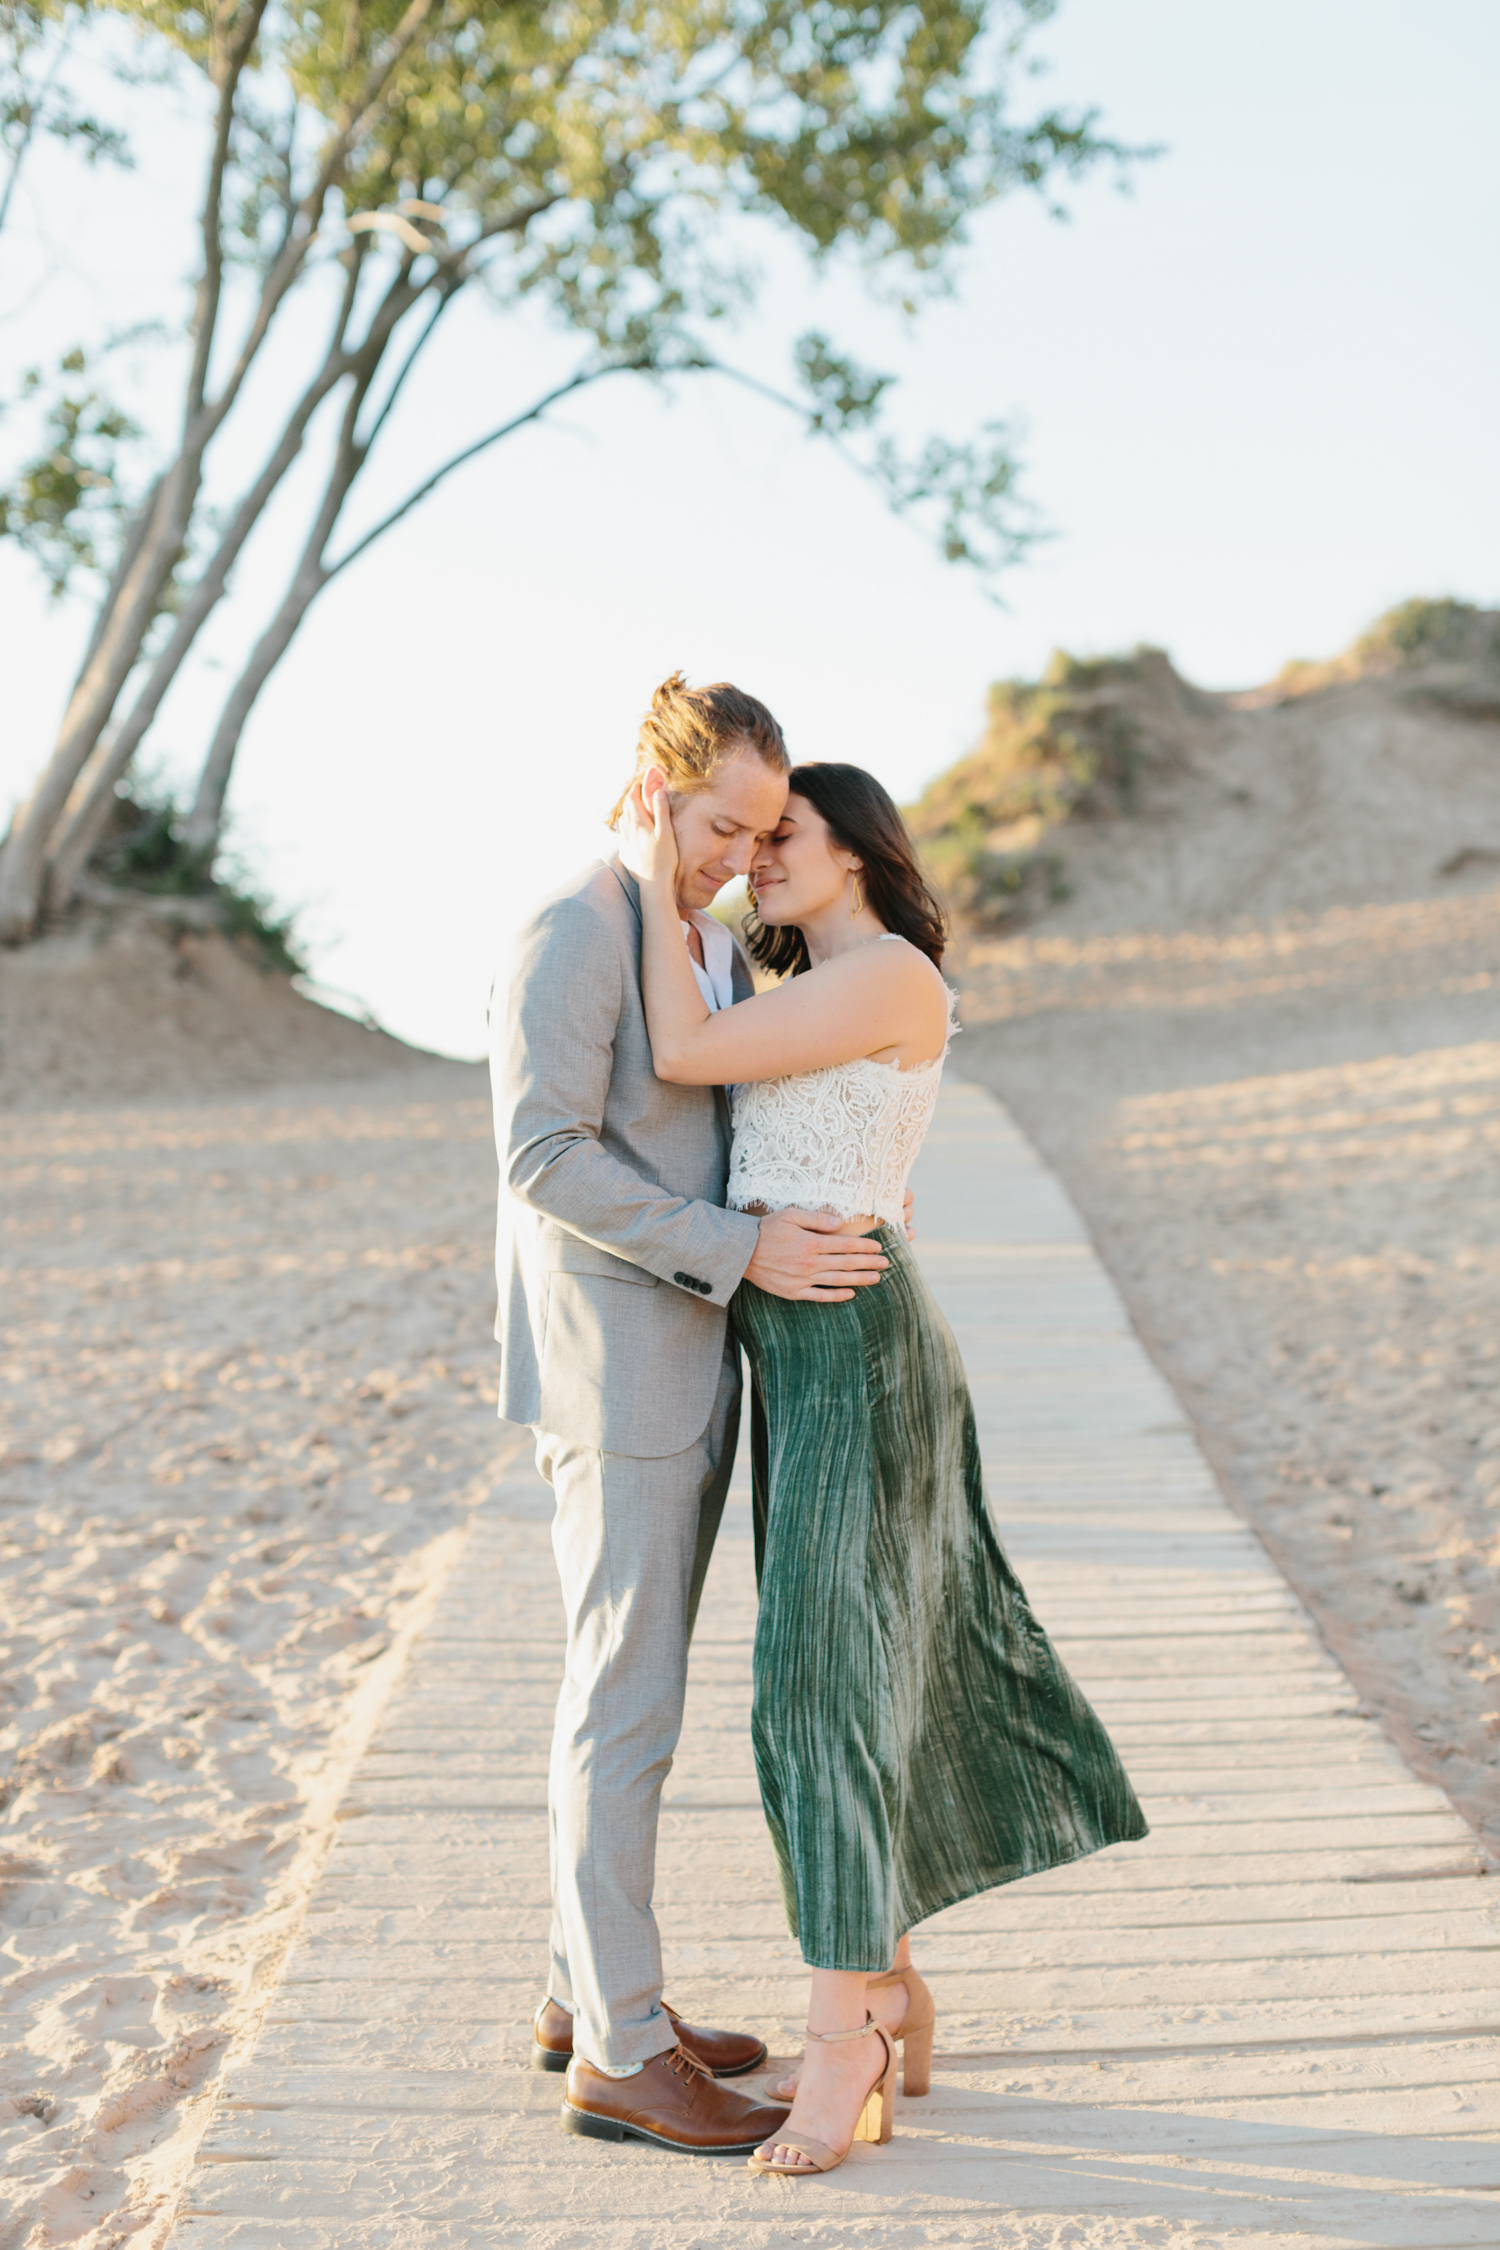 Sleeping Bear Dunes Elopement Wedding Photography by Mae Stier Northern Michigan Photographer-011.jpg